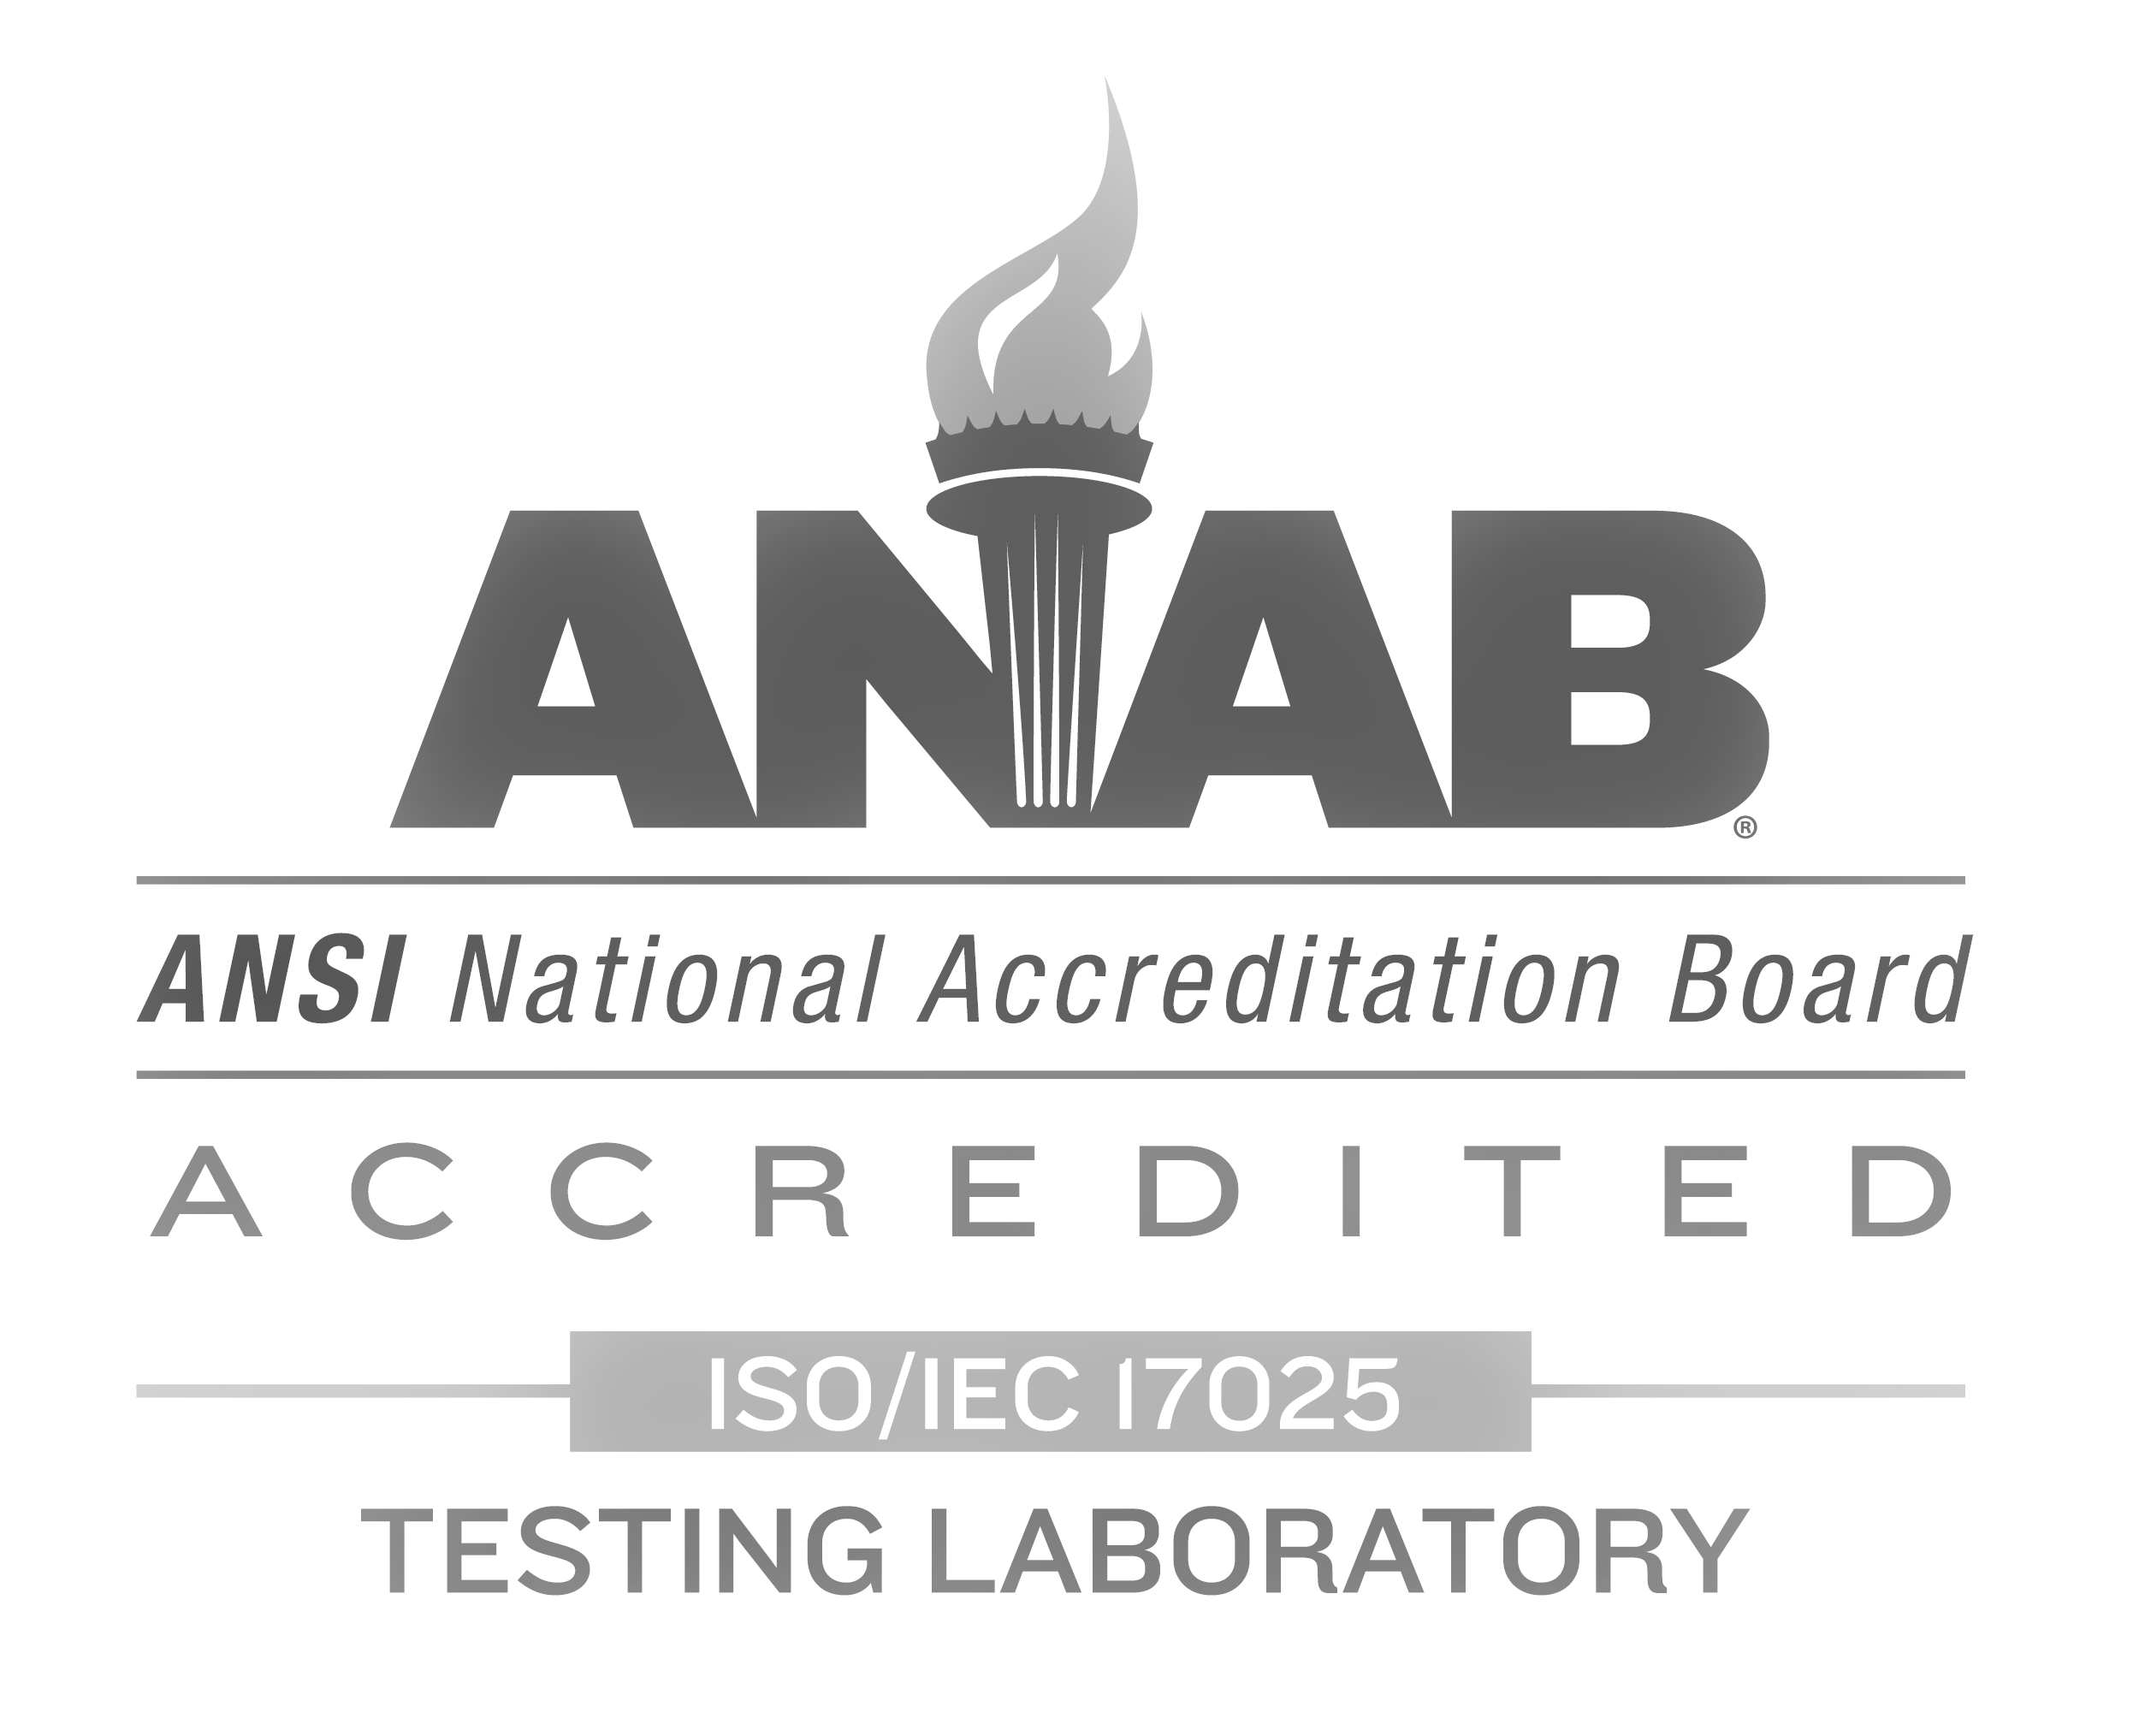 ANSI National Accreditation Board